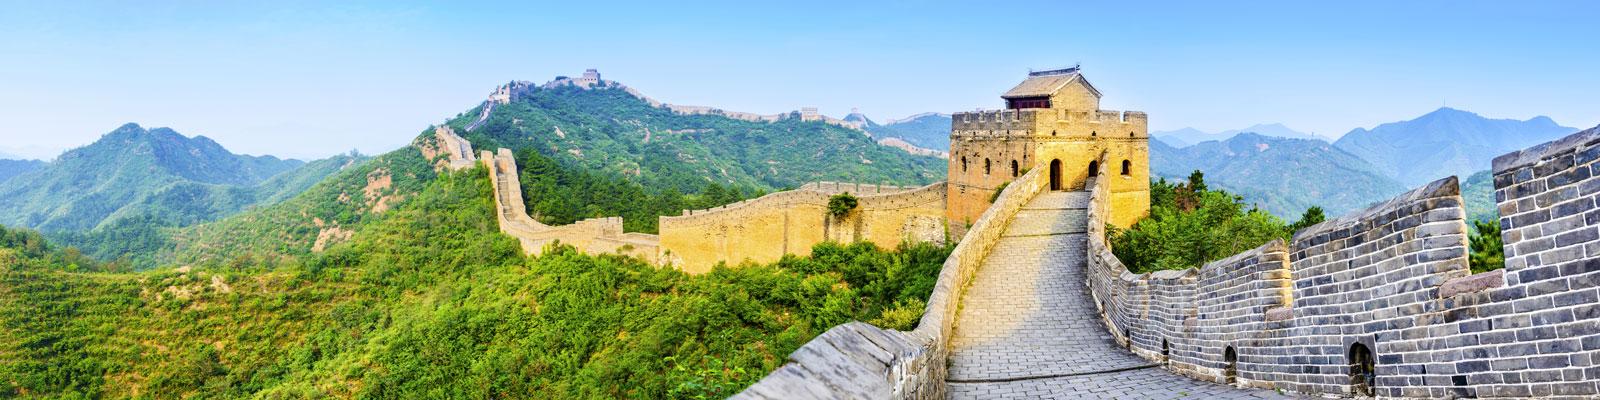 China Vegan Travel Guide